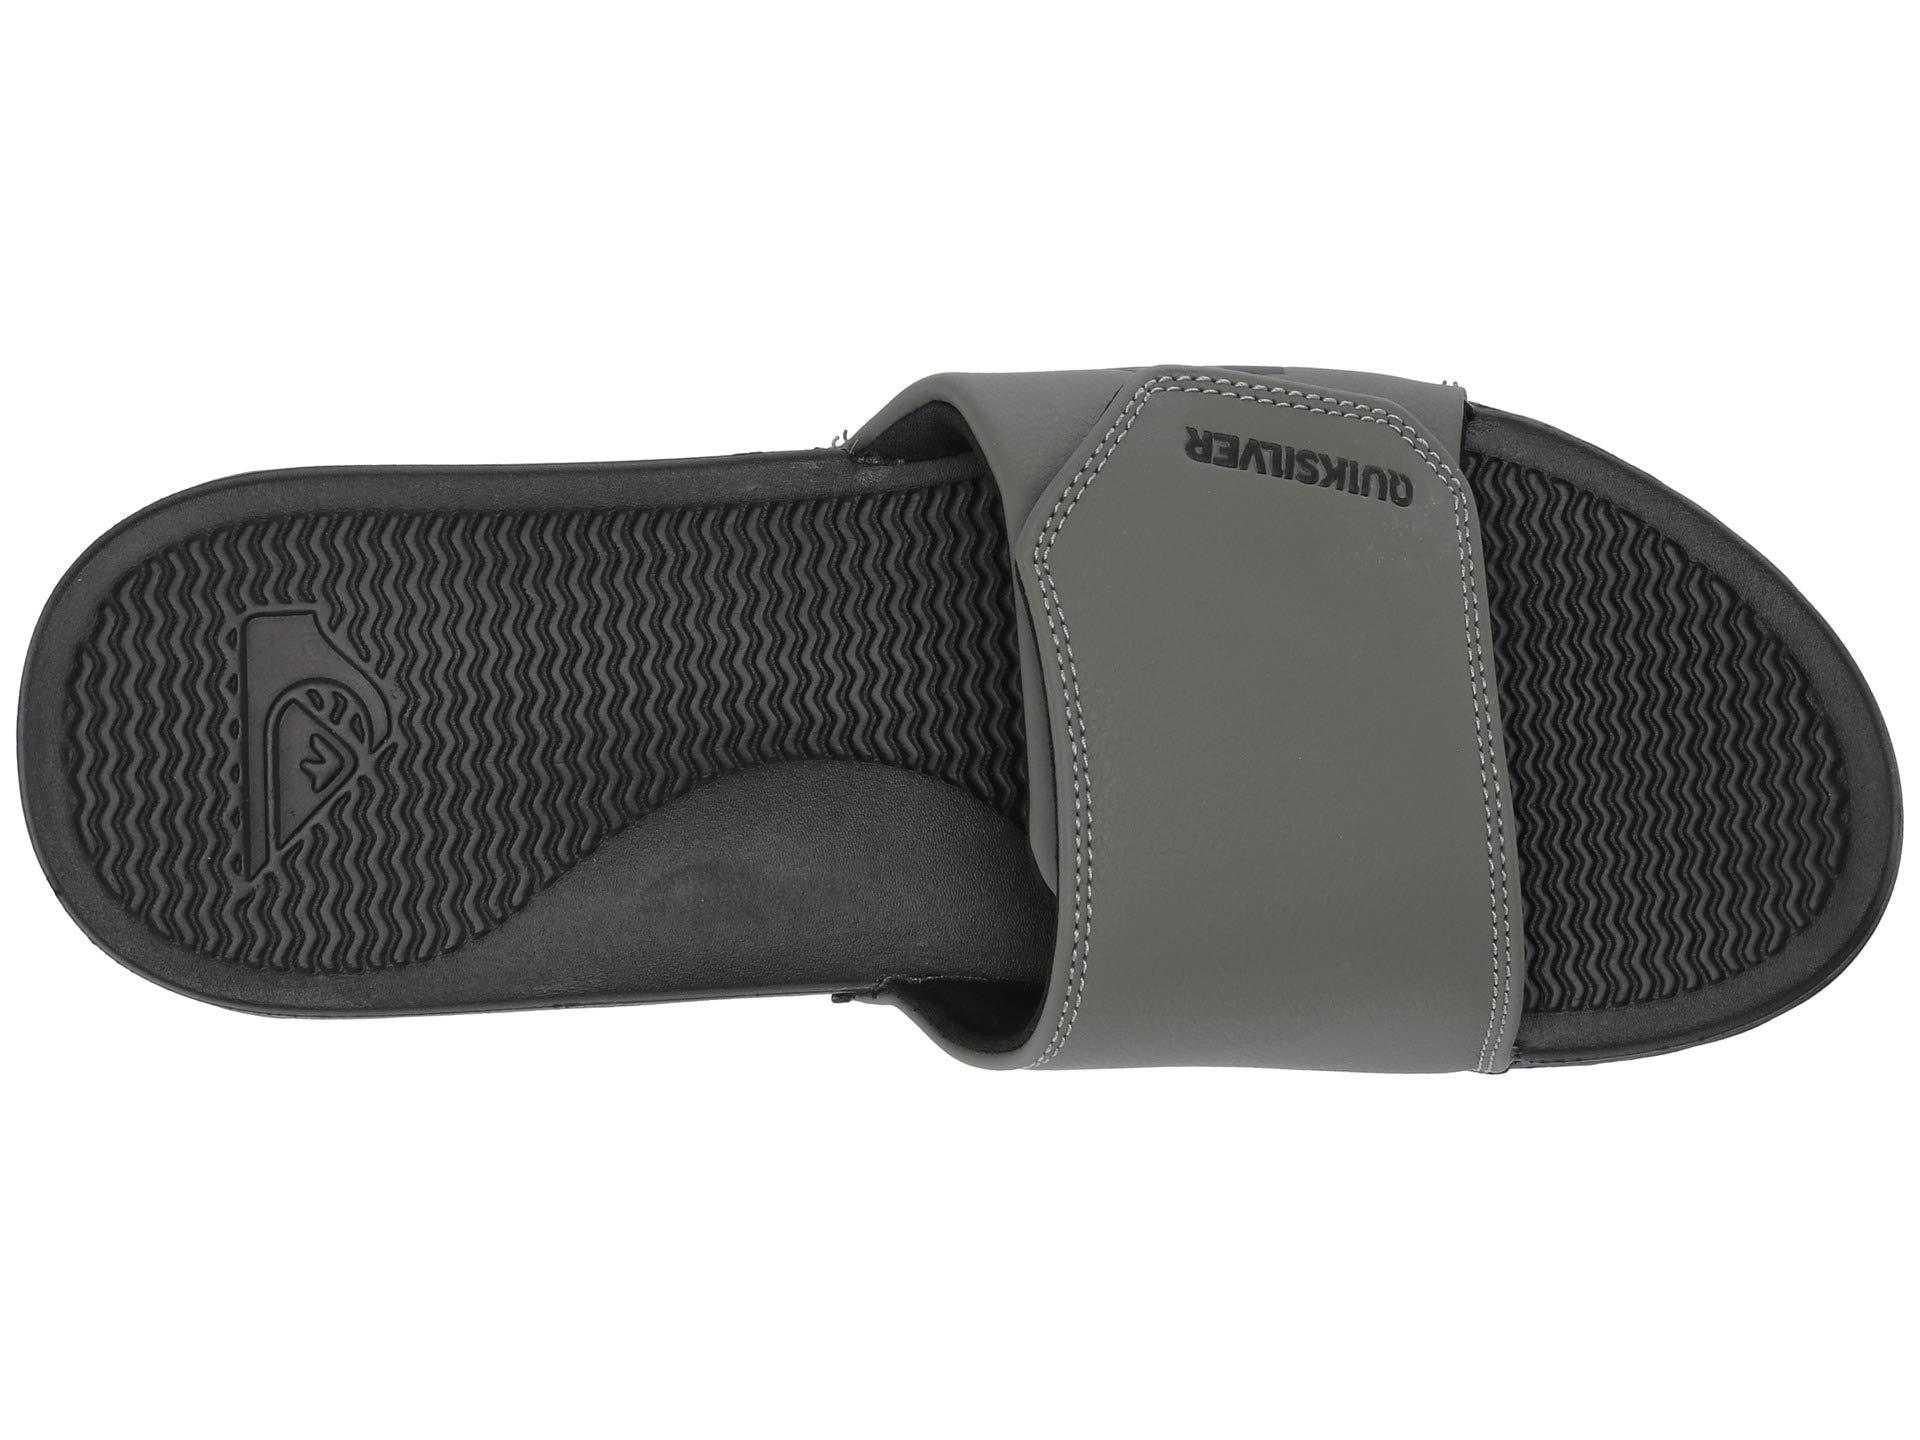 69be24bd51a Quiksilver - Shoreline Adjust (black black white) Men s Slide Shoes for  Men. View fullscreen